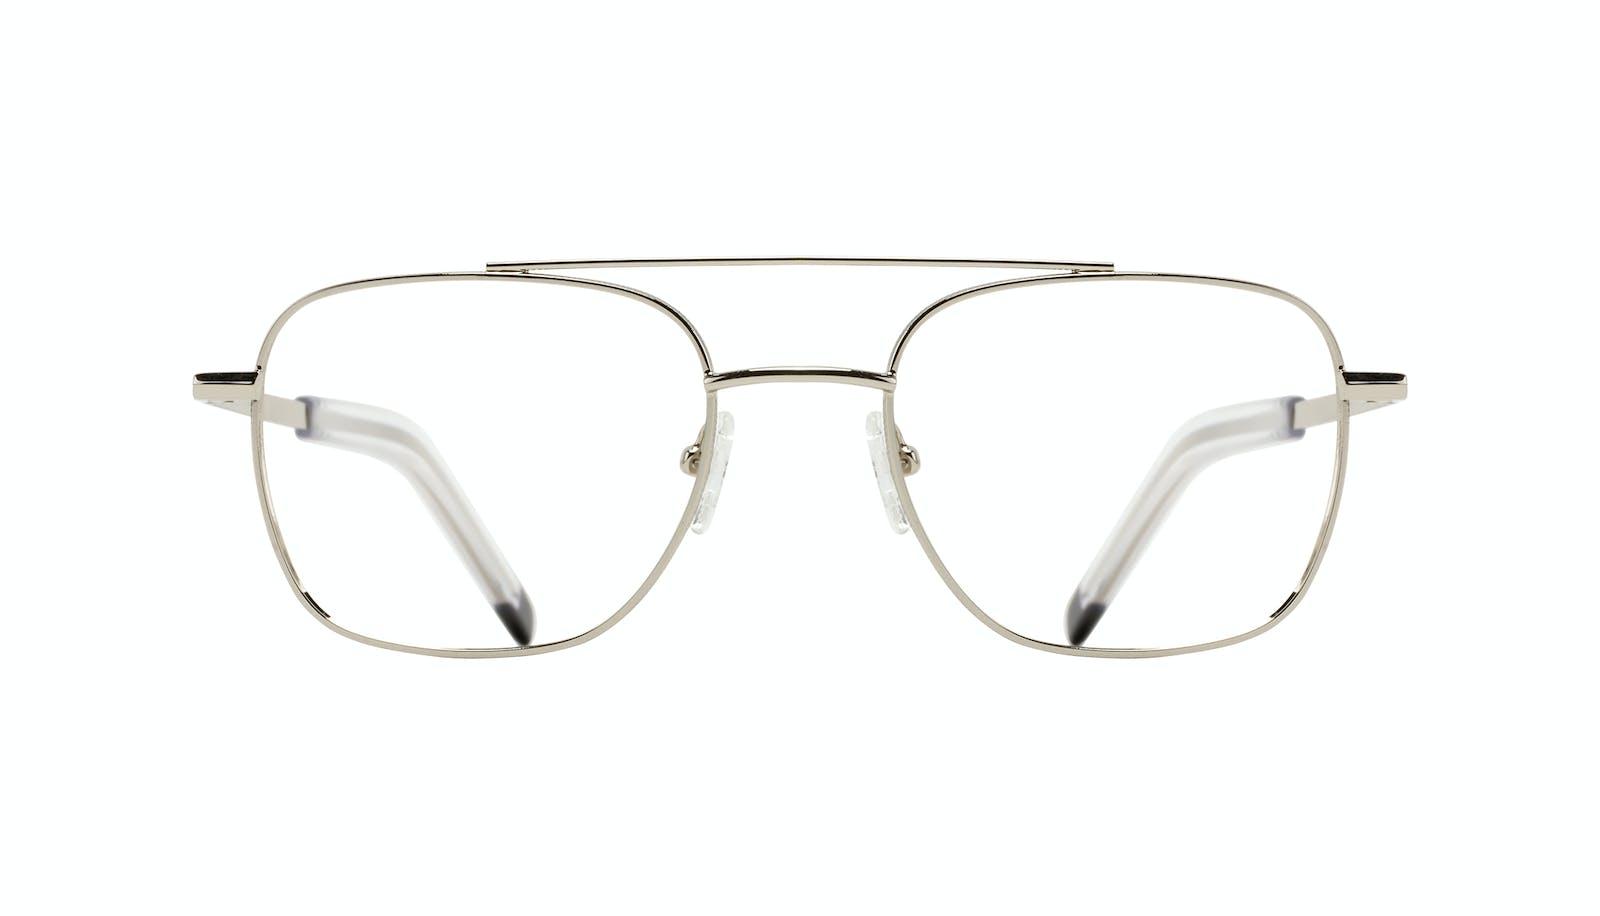 74ff8c019b Affordable Fashion Glasses Aviator Eyeglasses Men Drift Silver